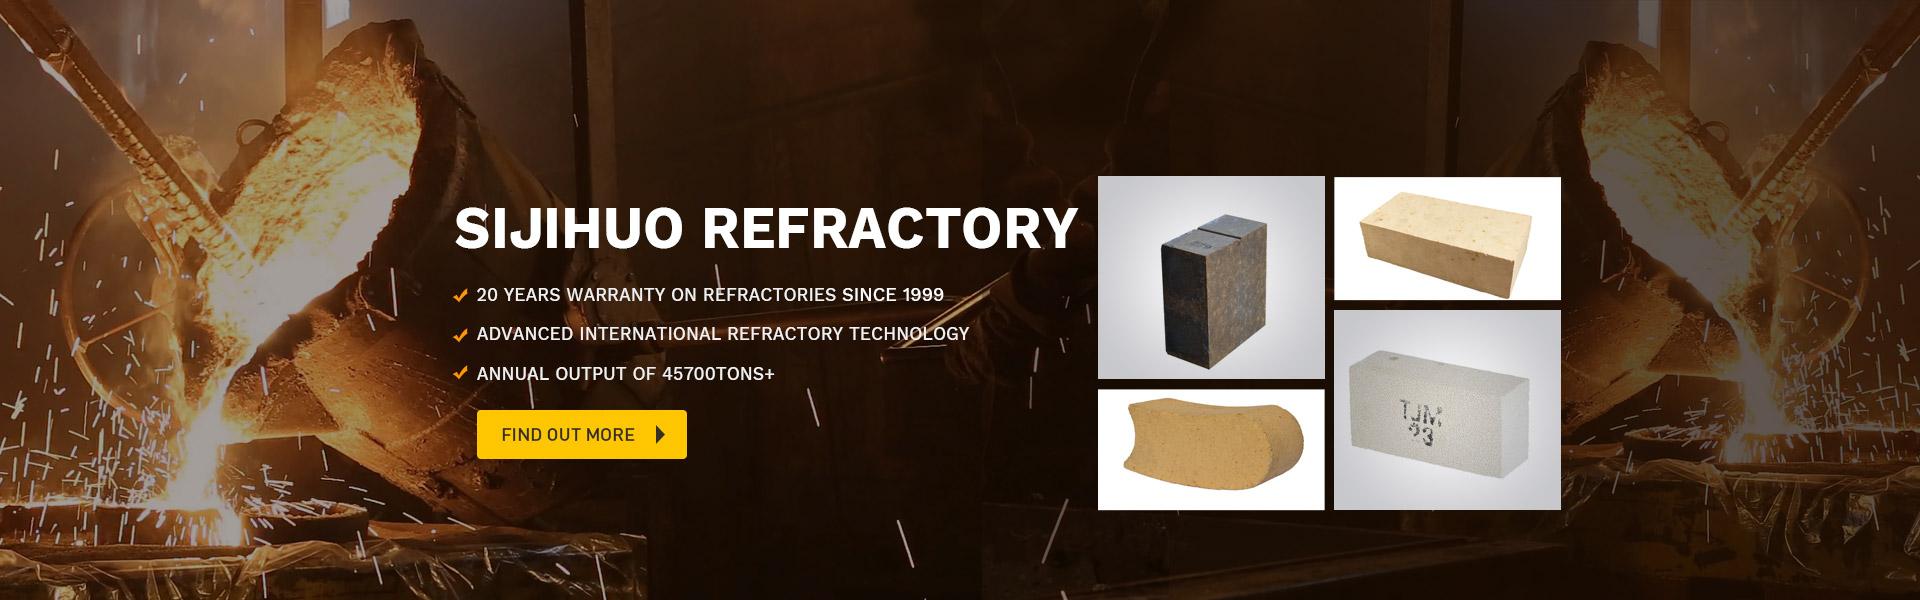 Sijihuo Refractory